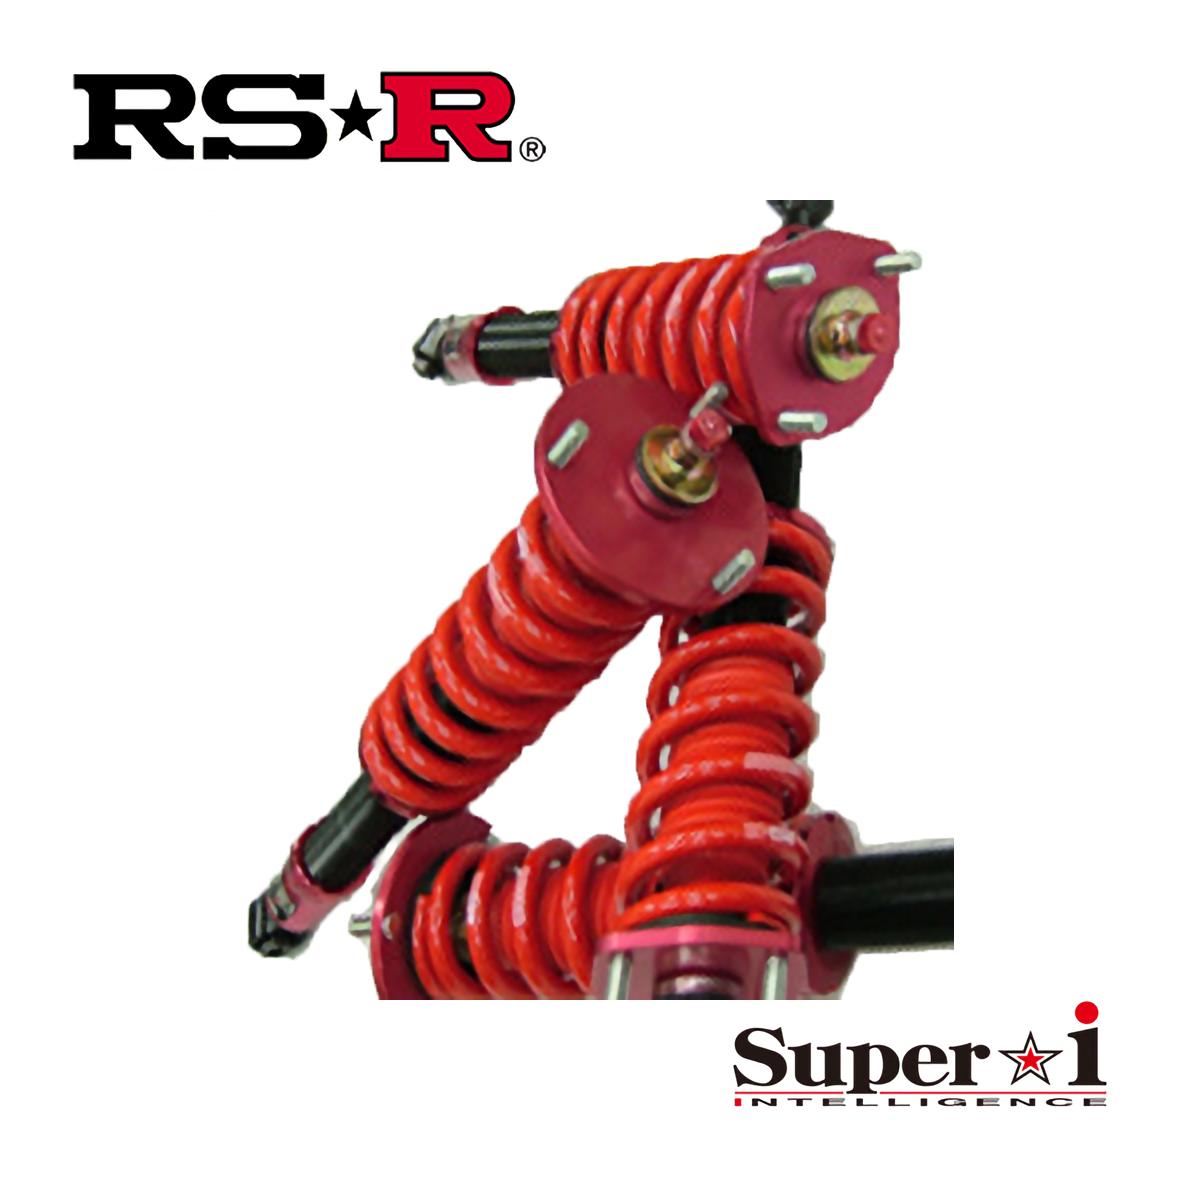 RS-R クラウンハイブリッド AZSH20 RSアドバンス 車高調 リア車高調整: ネジ式 SIT967M スーパーi RSR 個人宅発送追金有